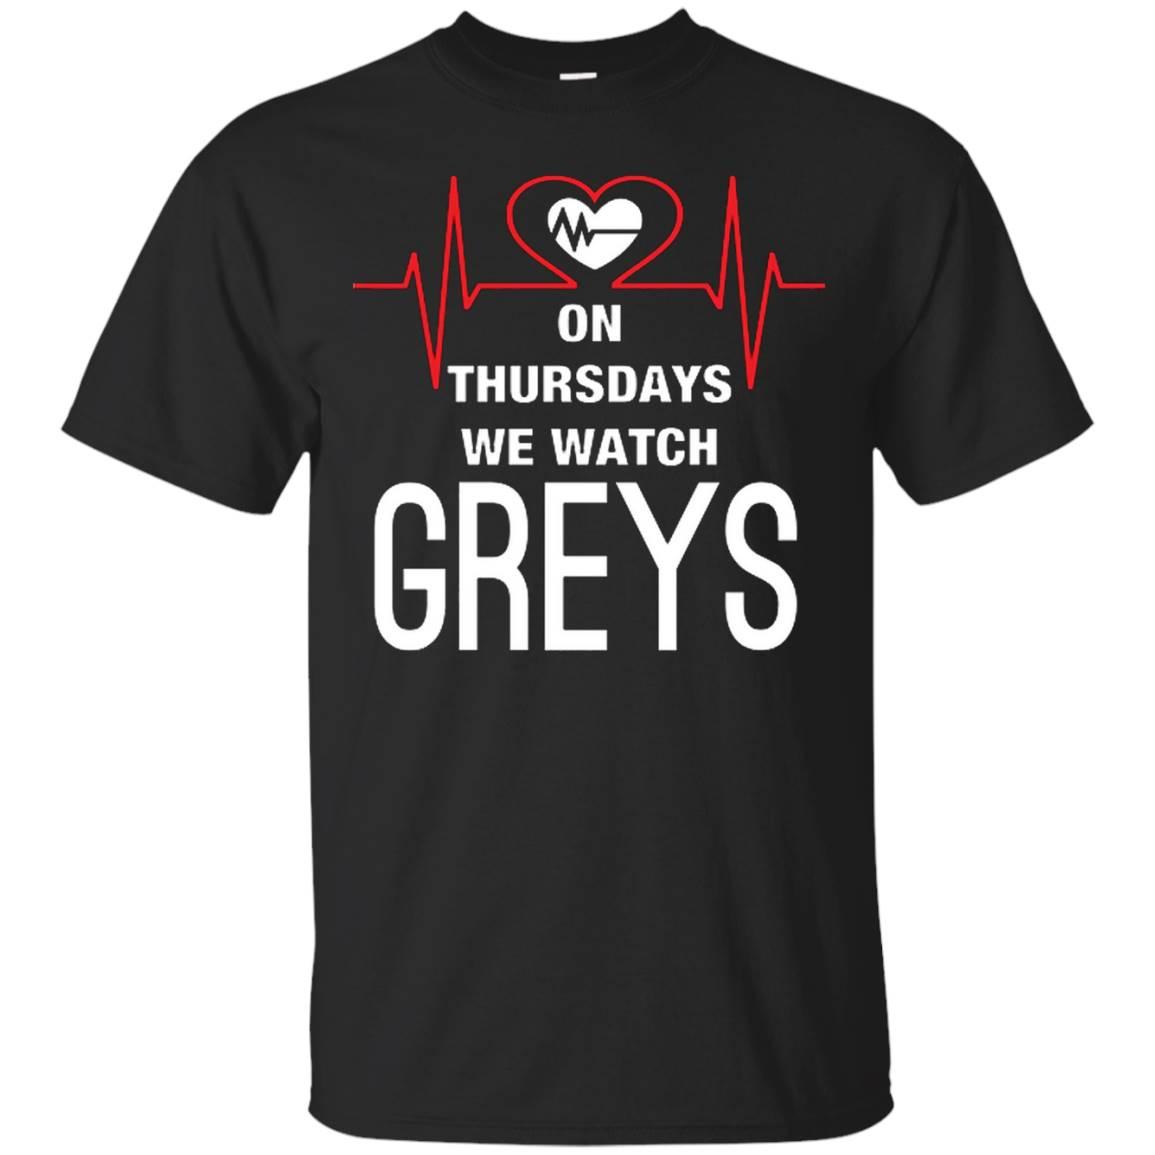 On Thursdays We Watch Greys T Shirt